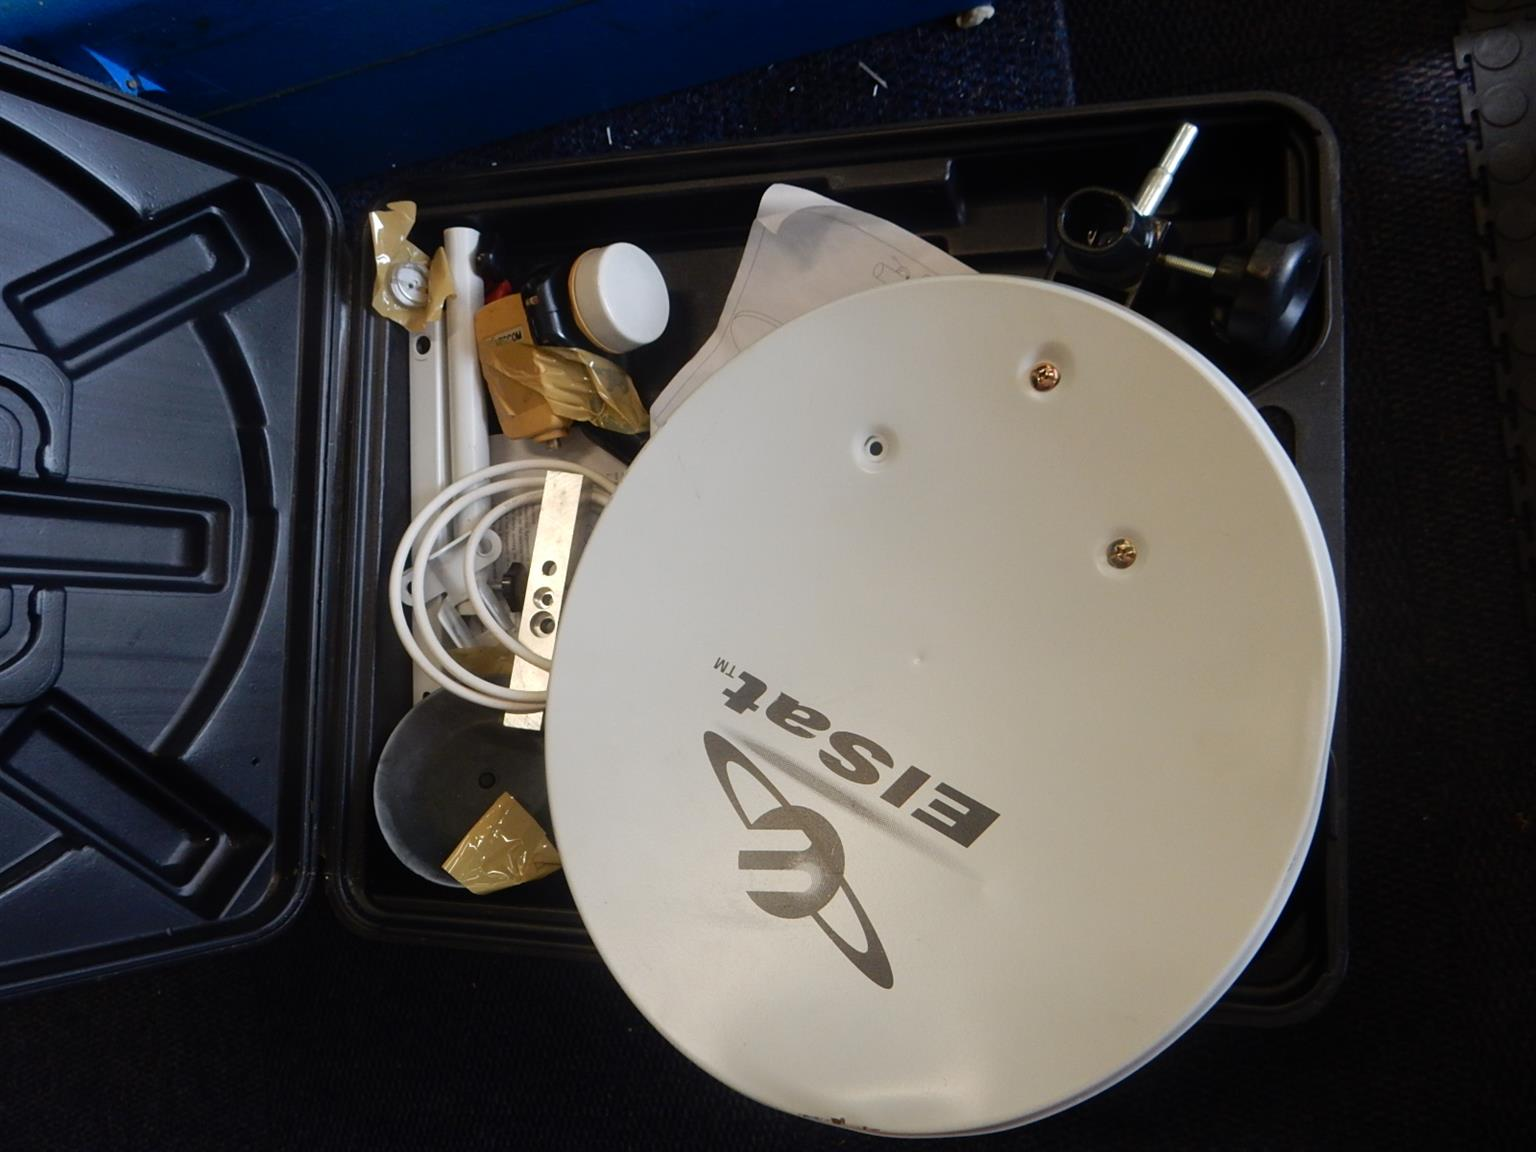 Elsat Portable Satellite Dish